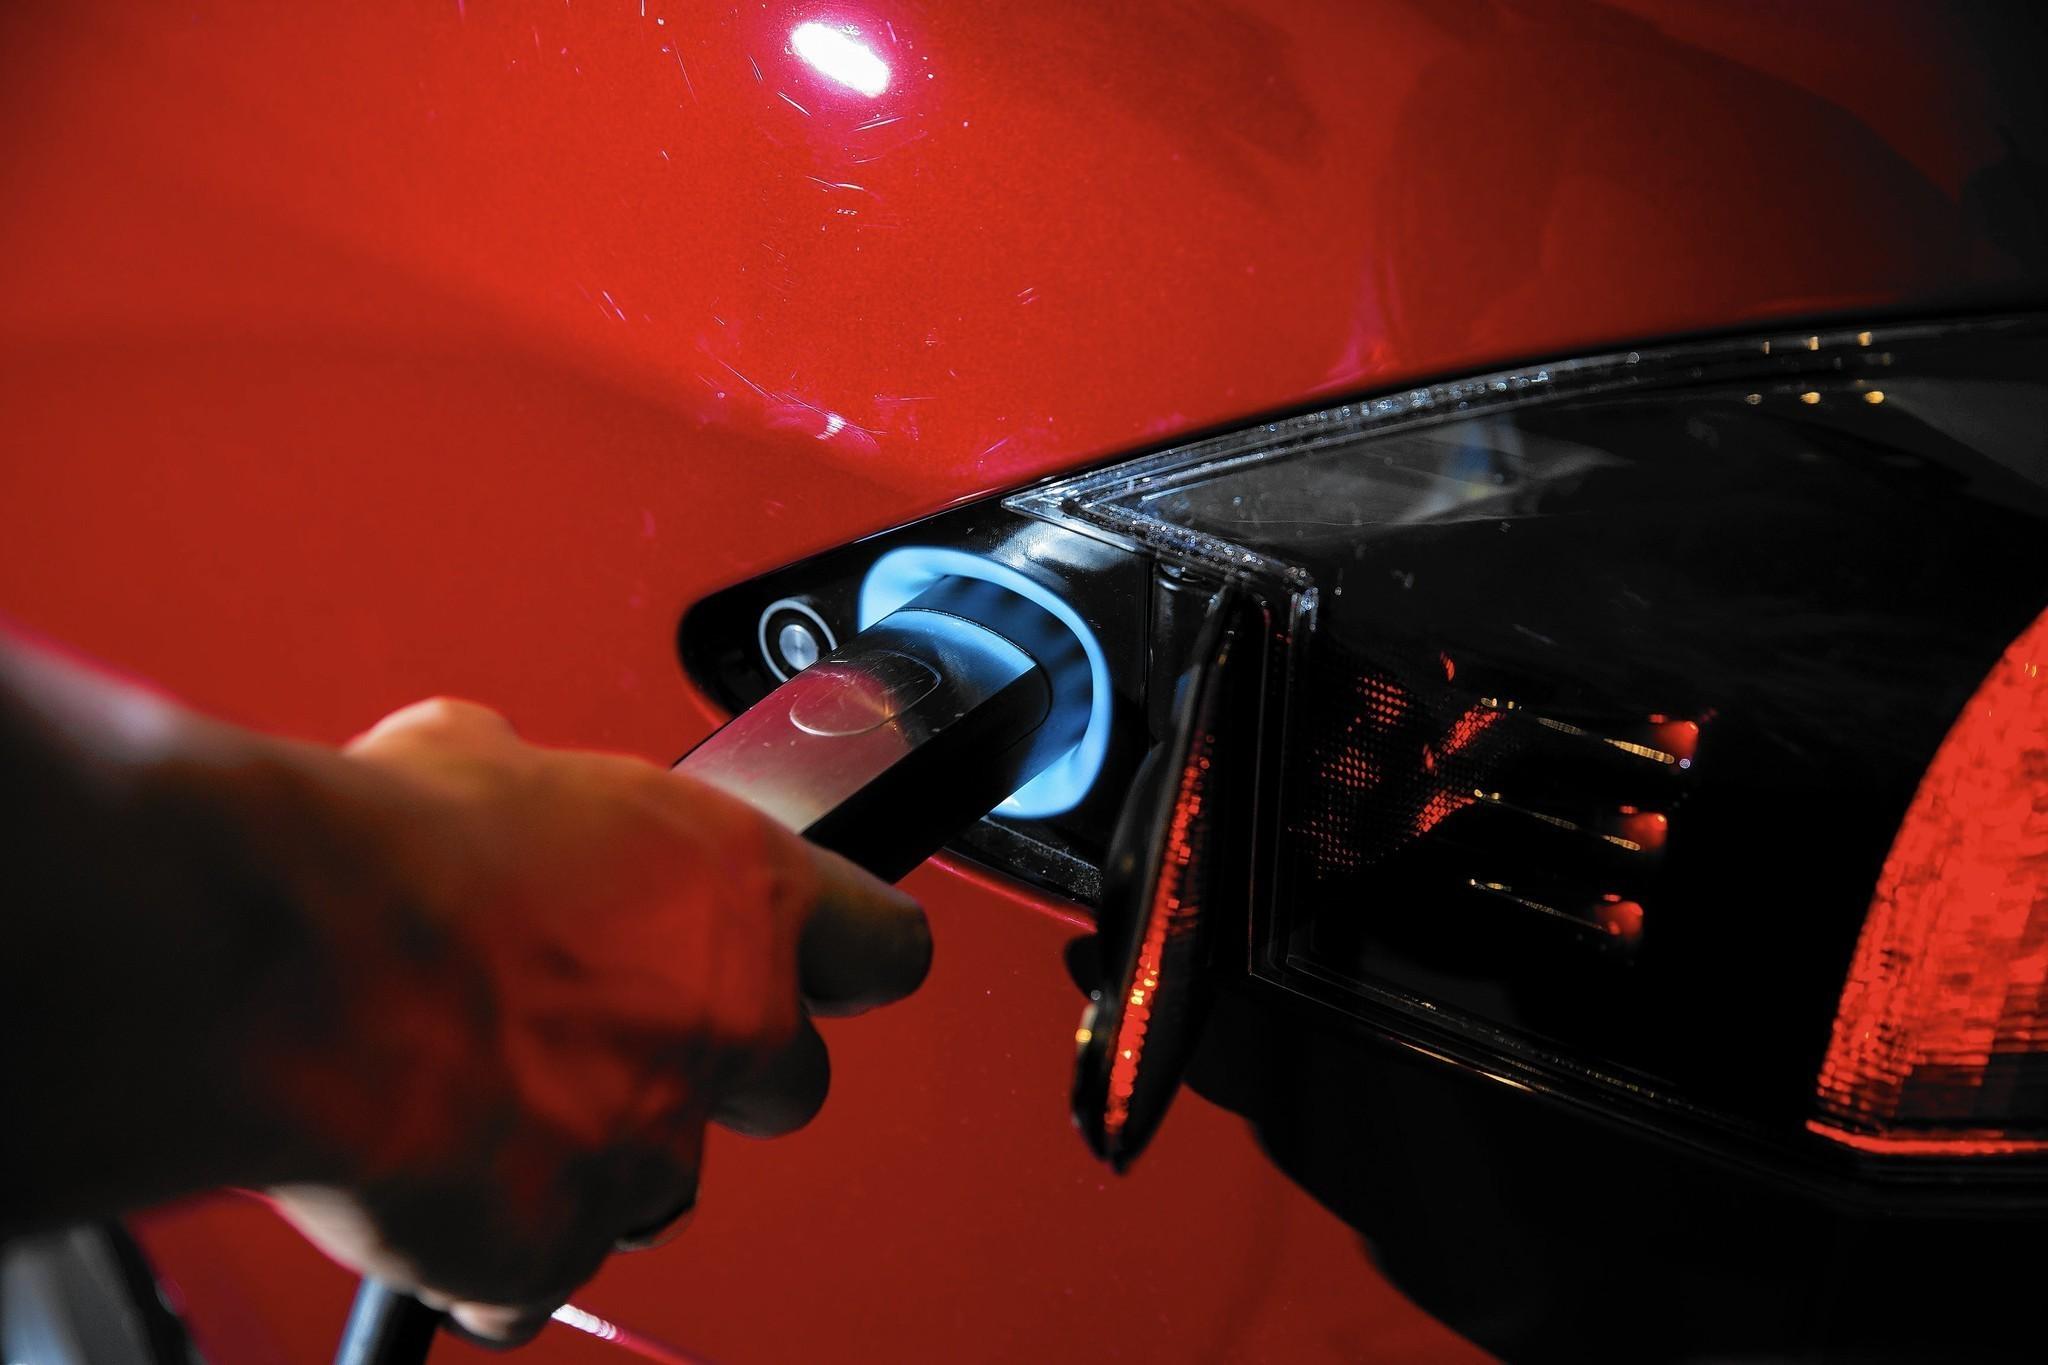 Hybrid Rebates California Limits Hybrid Rebates To Households Earning Less Than